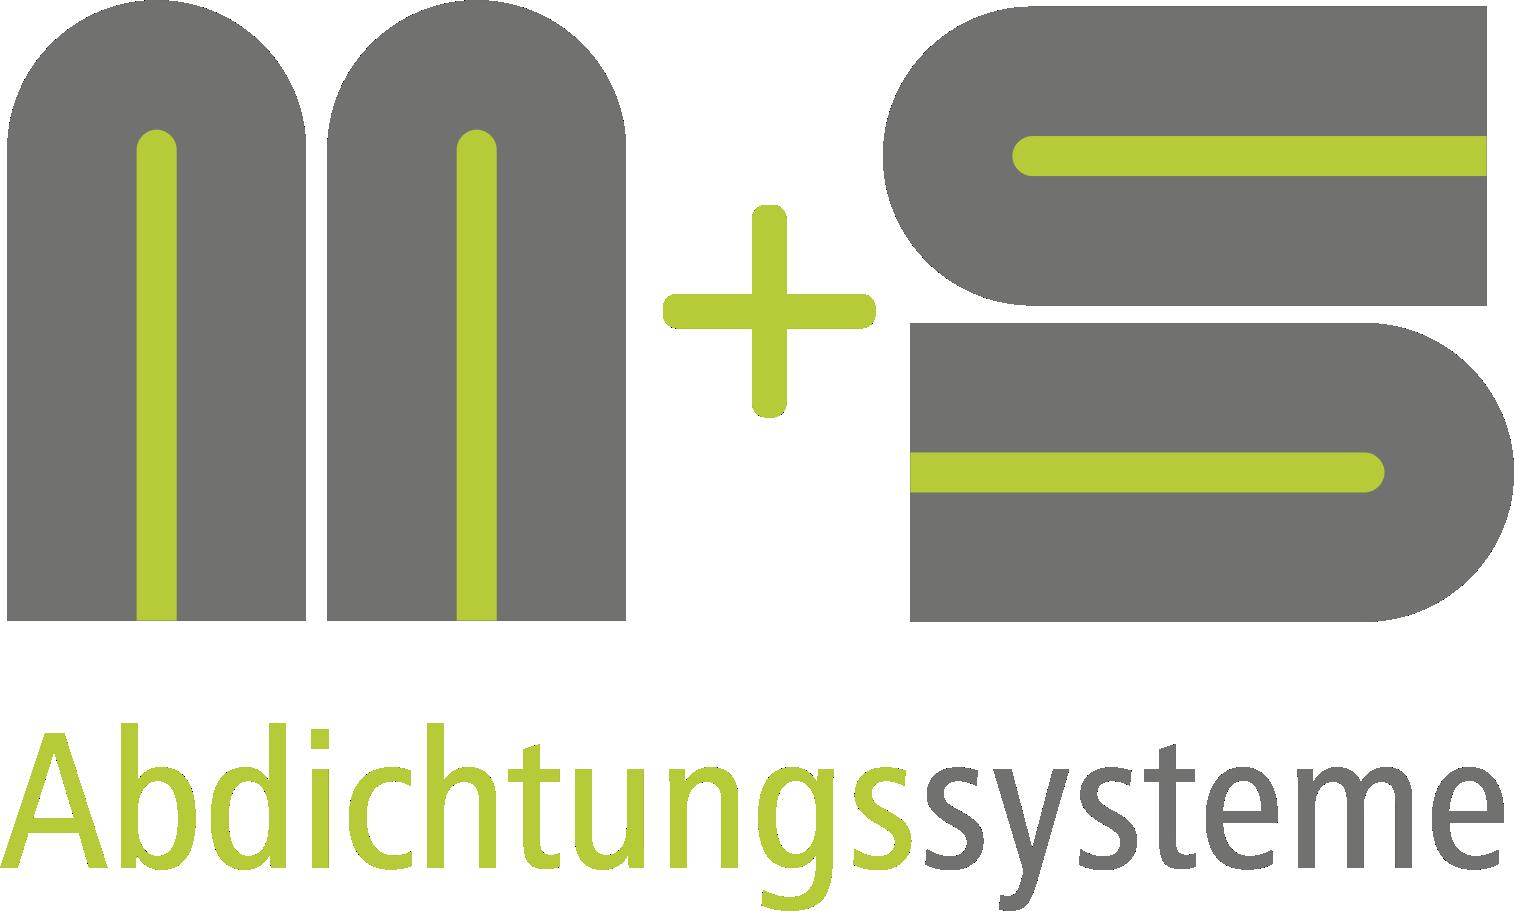 M+S Abdichtungssysteme GmbH & Co. KG